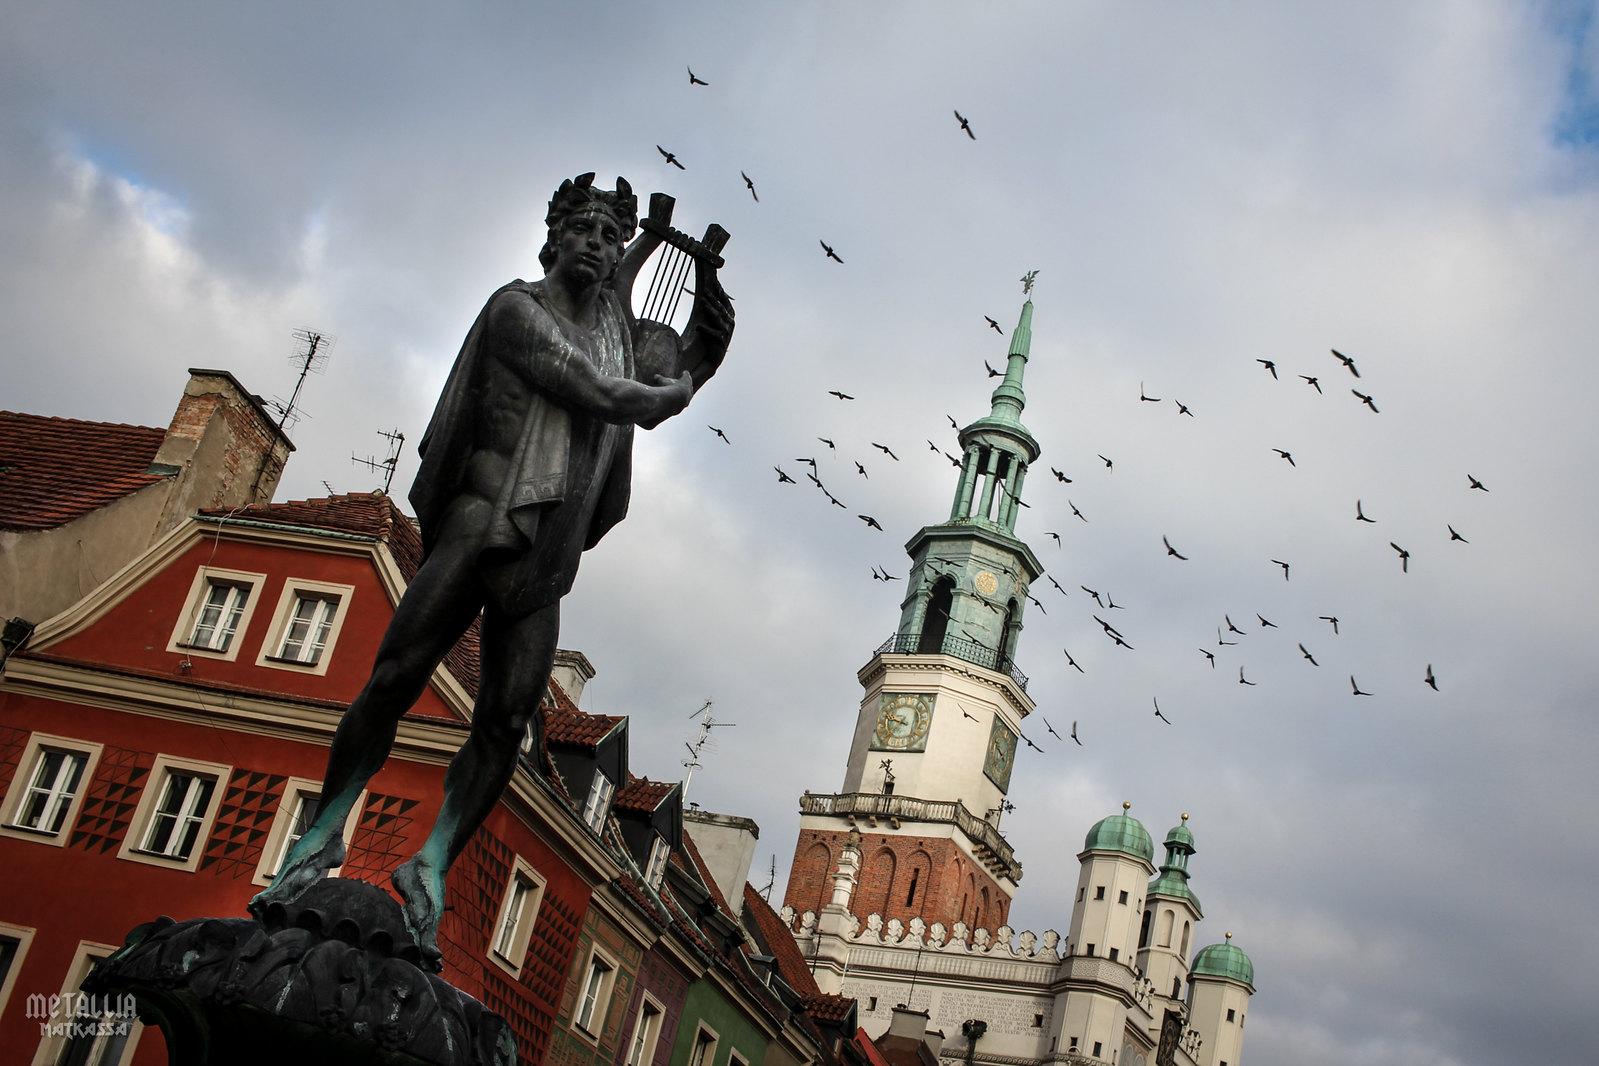 poznan, visit poznan, old town poznan, poznanin vanhakaupunki, stary runek, stare miasto